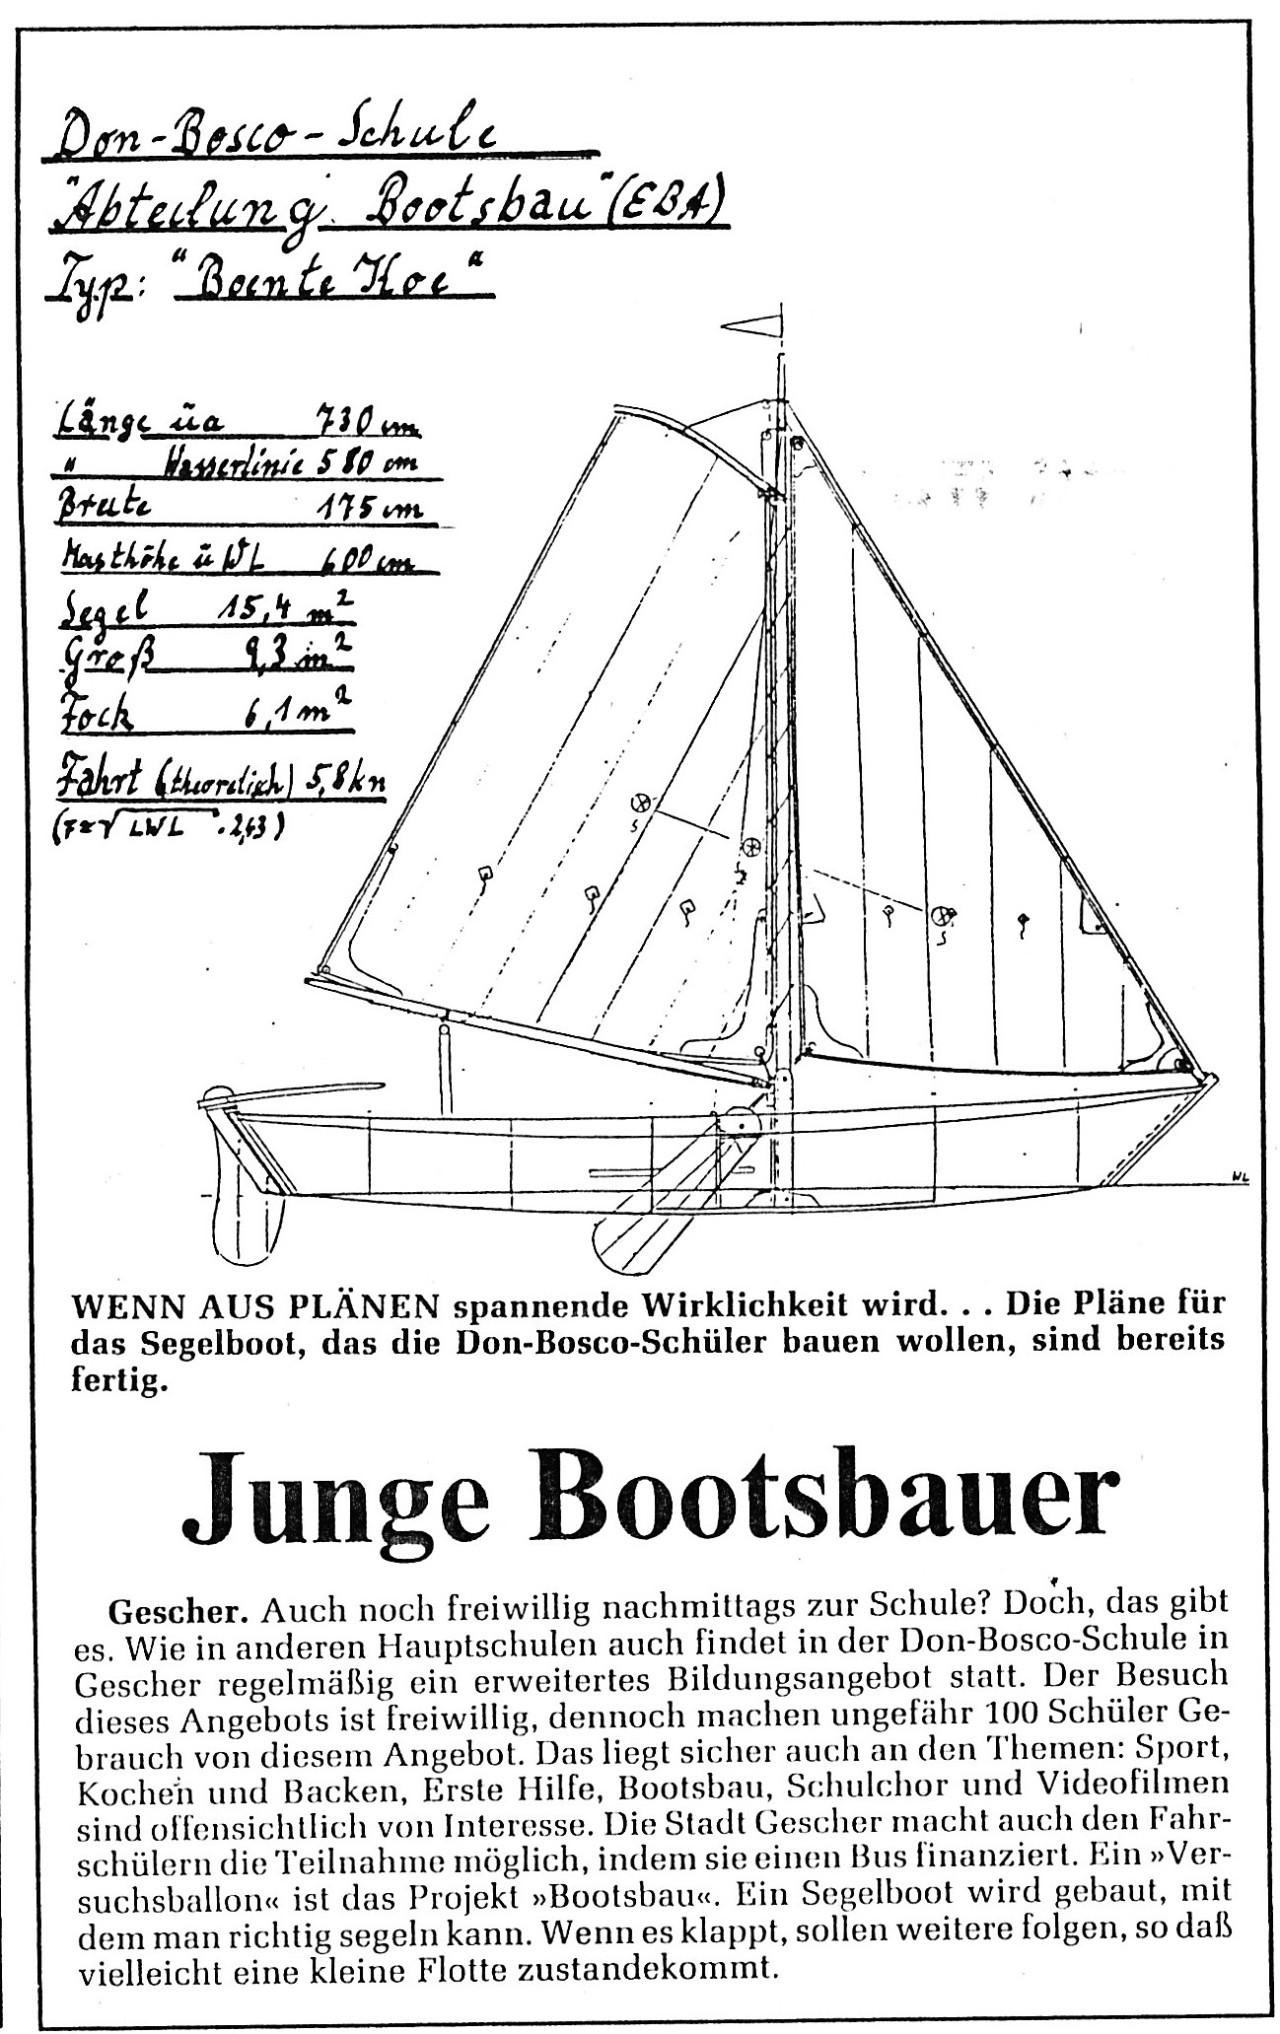 Beste Haut Auf Segelboot Pläne Rahmen Fotos - Rahmen Ideen ...